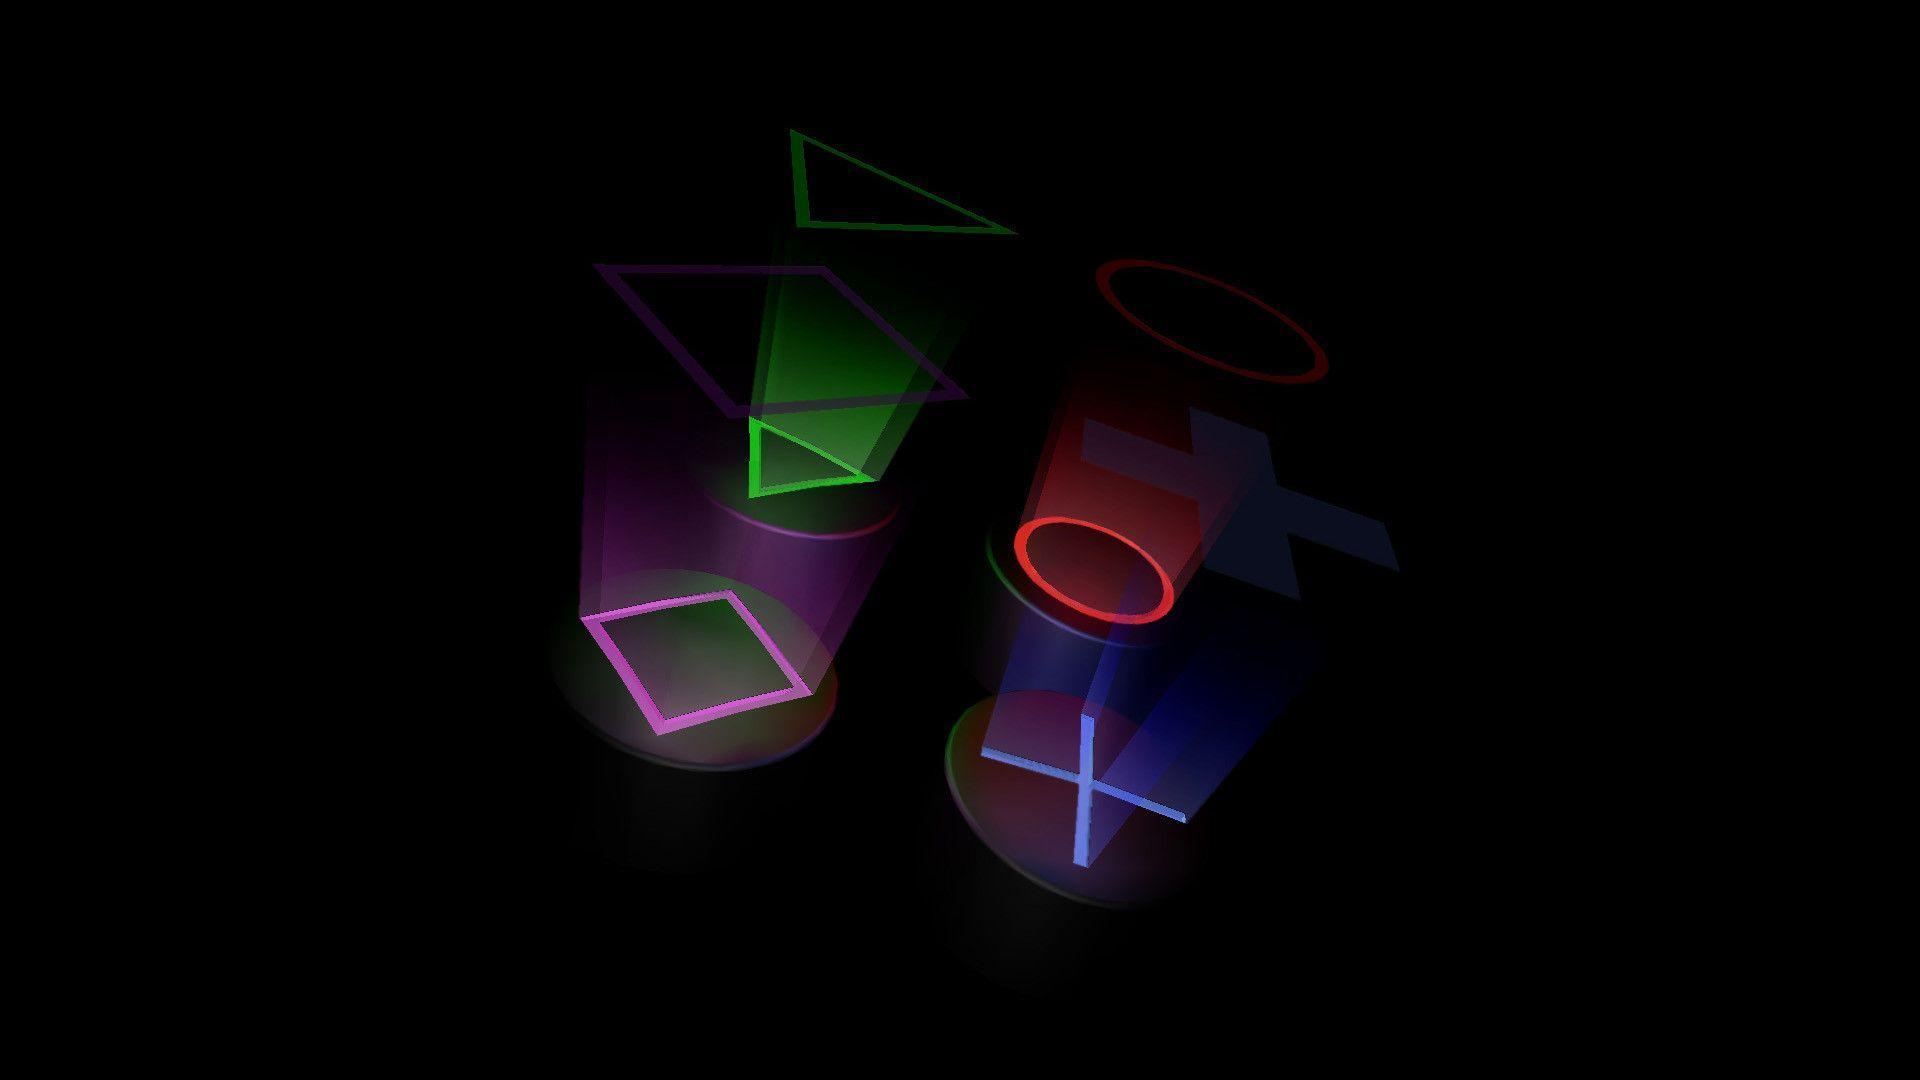 PlayStation 1 Wallpapers - Top Free PlayStation 1 ...